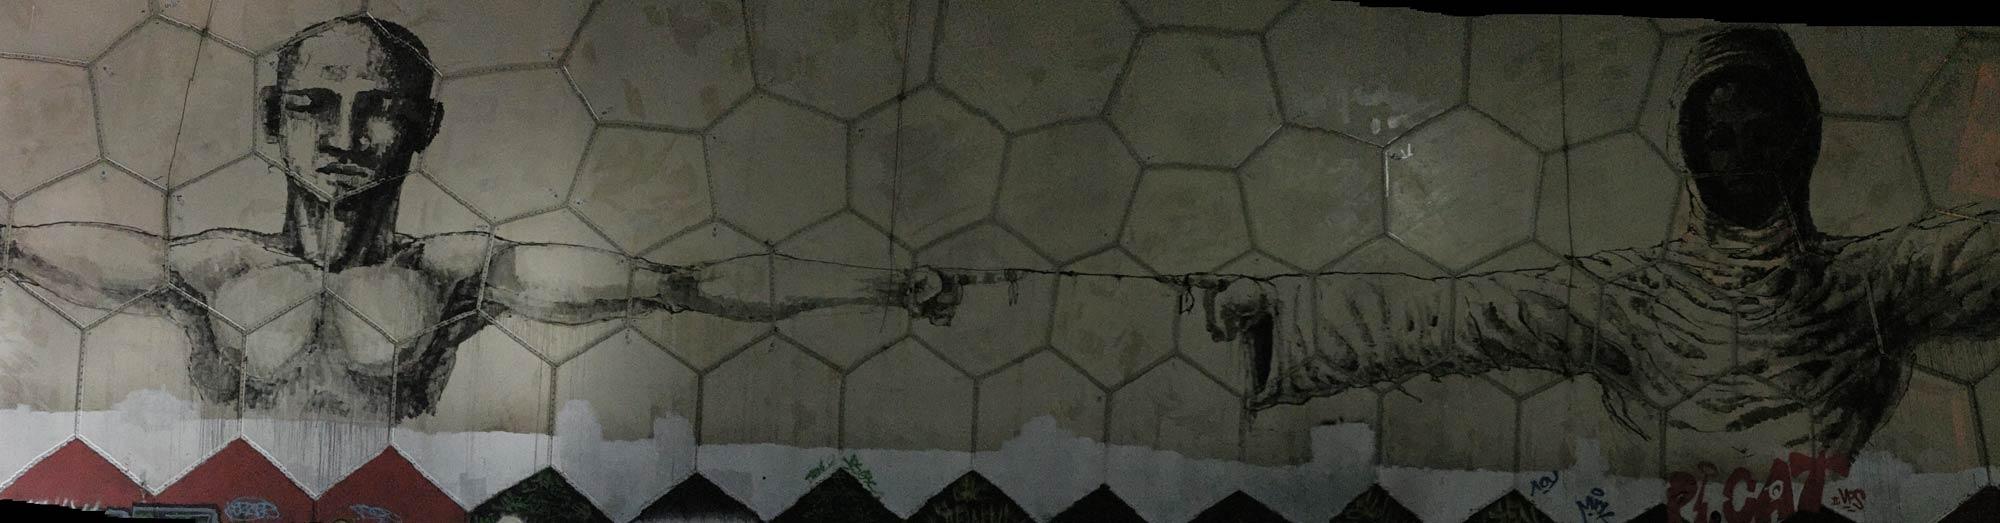 brooklyn-street-art-alaniz-jaime-rojo-06-26-2016-web-5